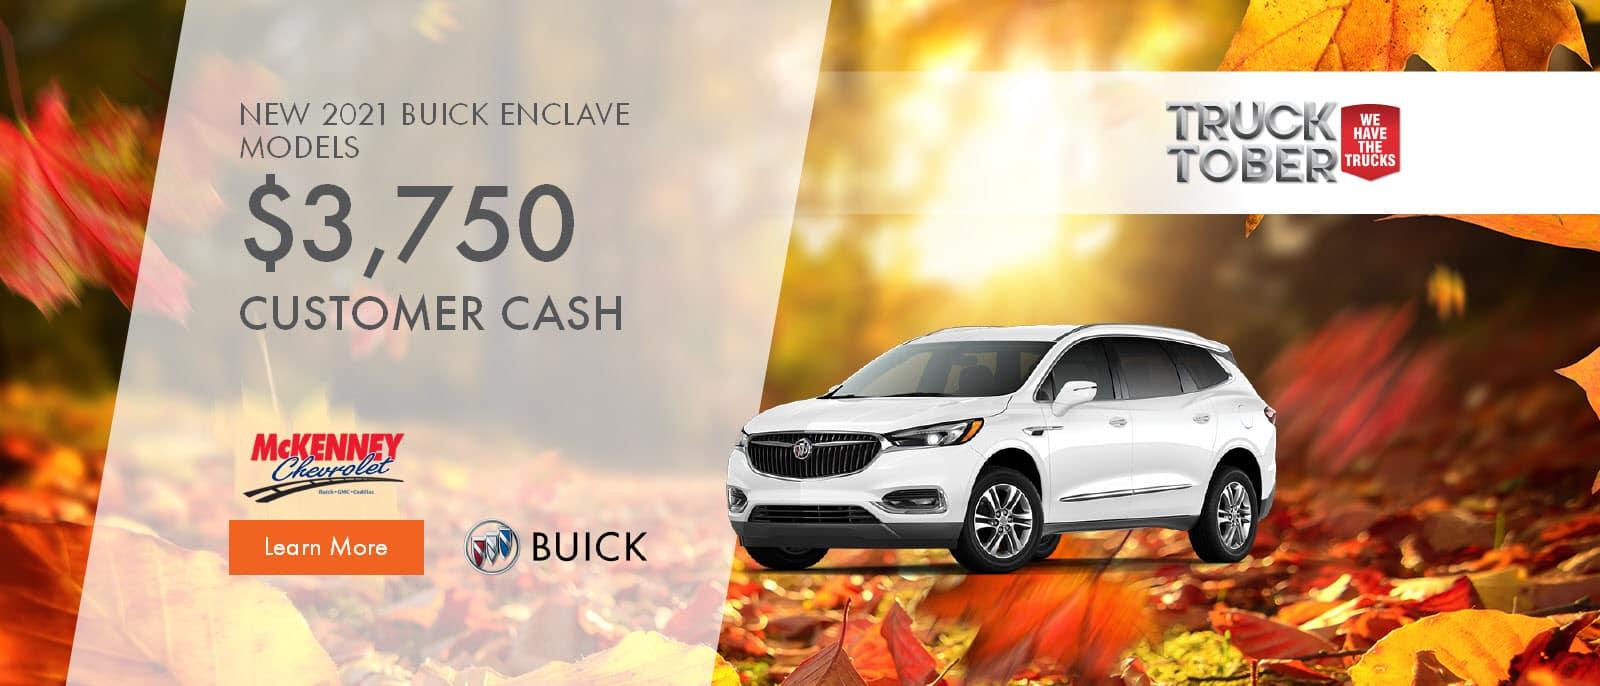 2021 Buick Enclave Models